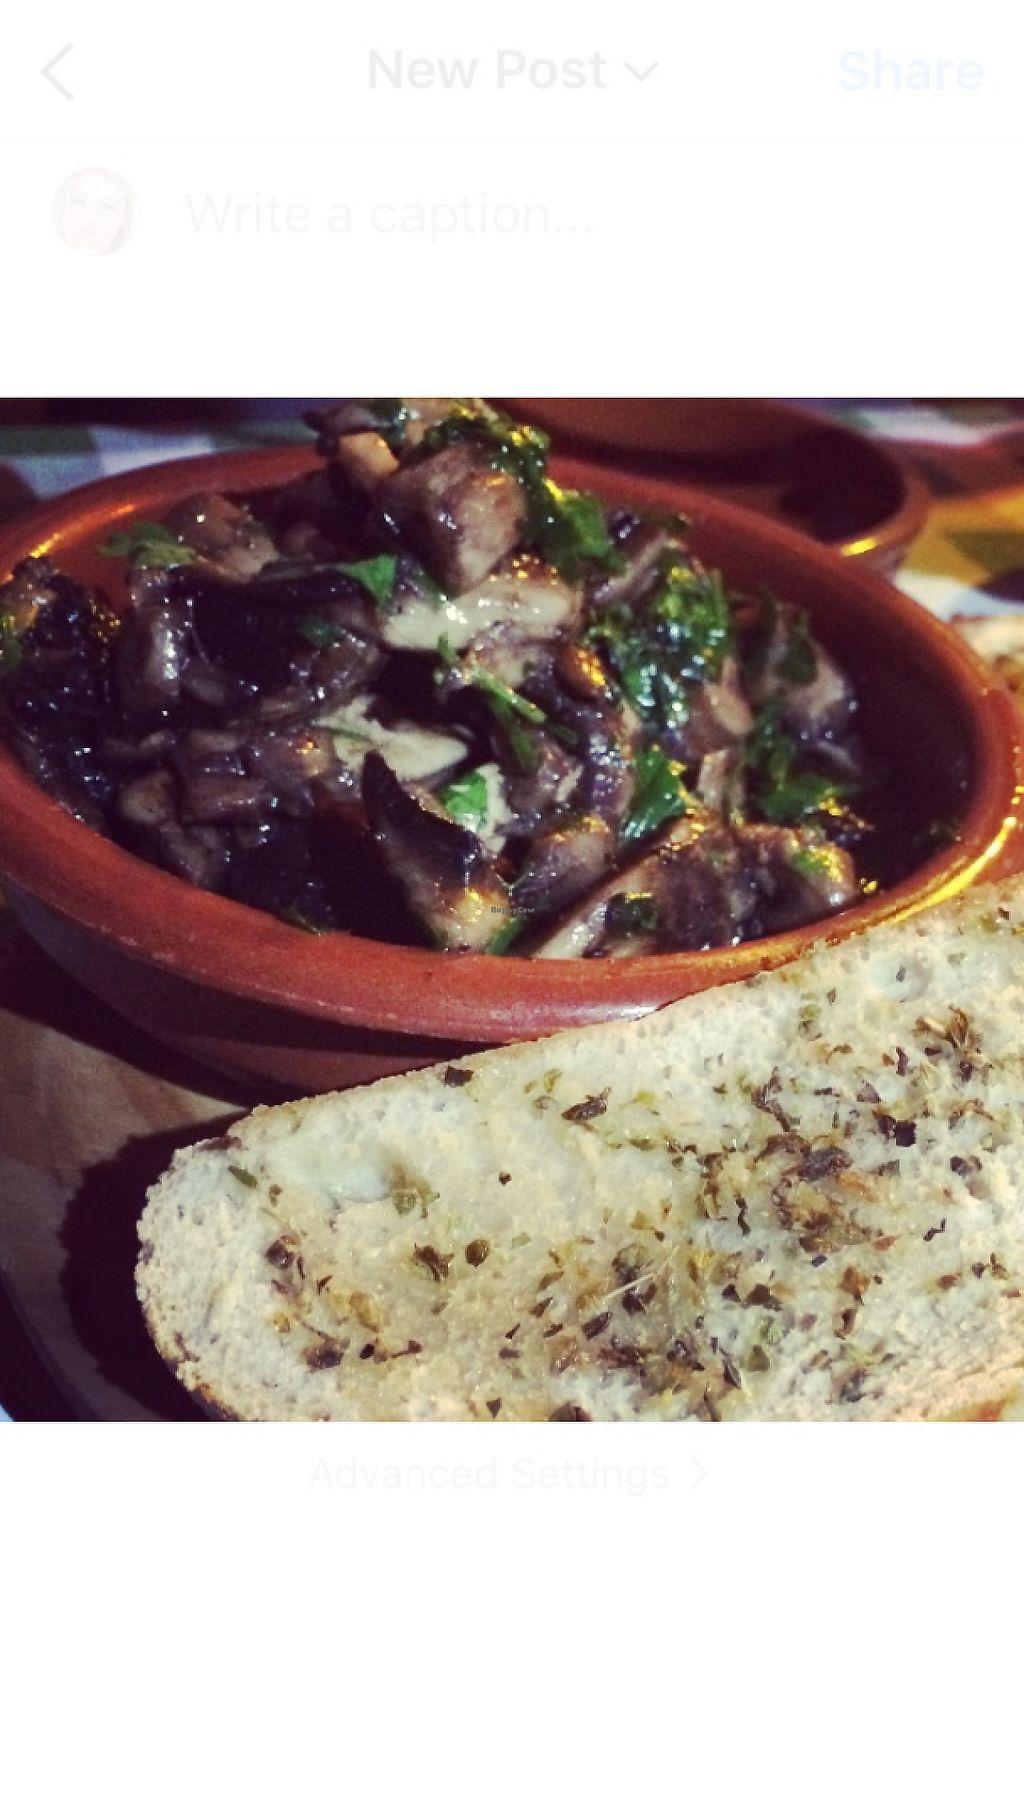 "Photo of La Casseruola  by <a href=""/members/profile/EmmaSchofield"">EmmaSchofield</a> <br/>Garlic mushrooms  <br/> June 2, 2017  - <a href='/contact/abuse/image/83870/265088'>Report</a>"